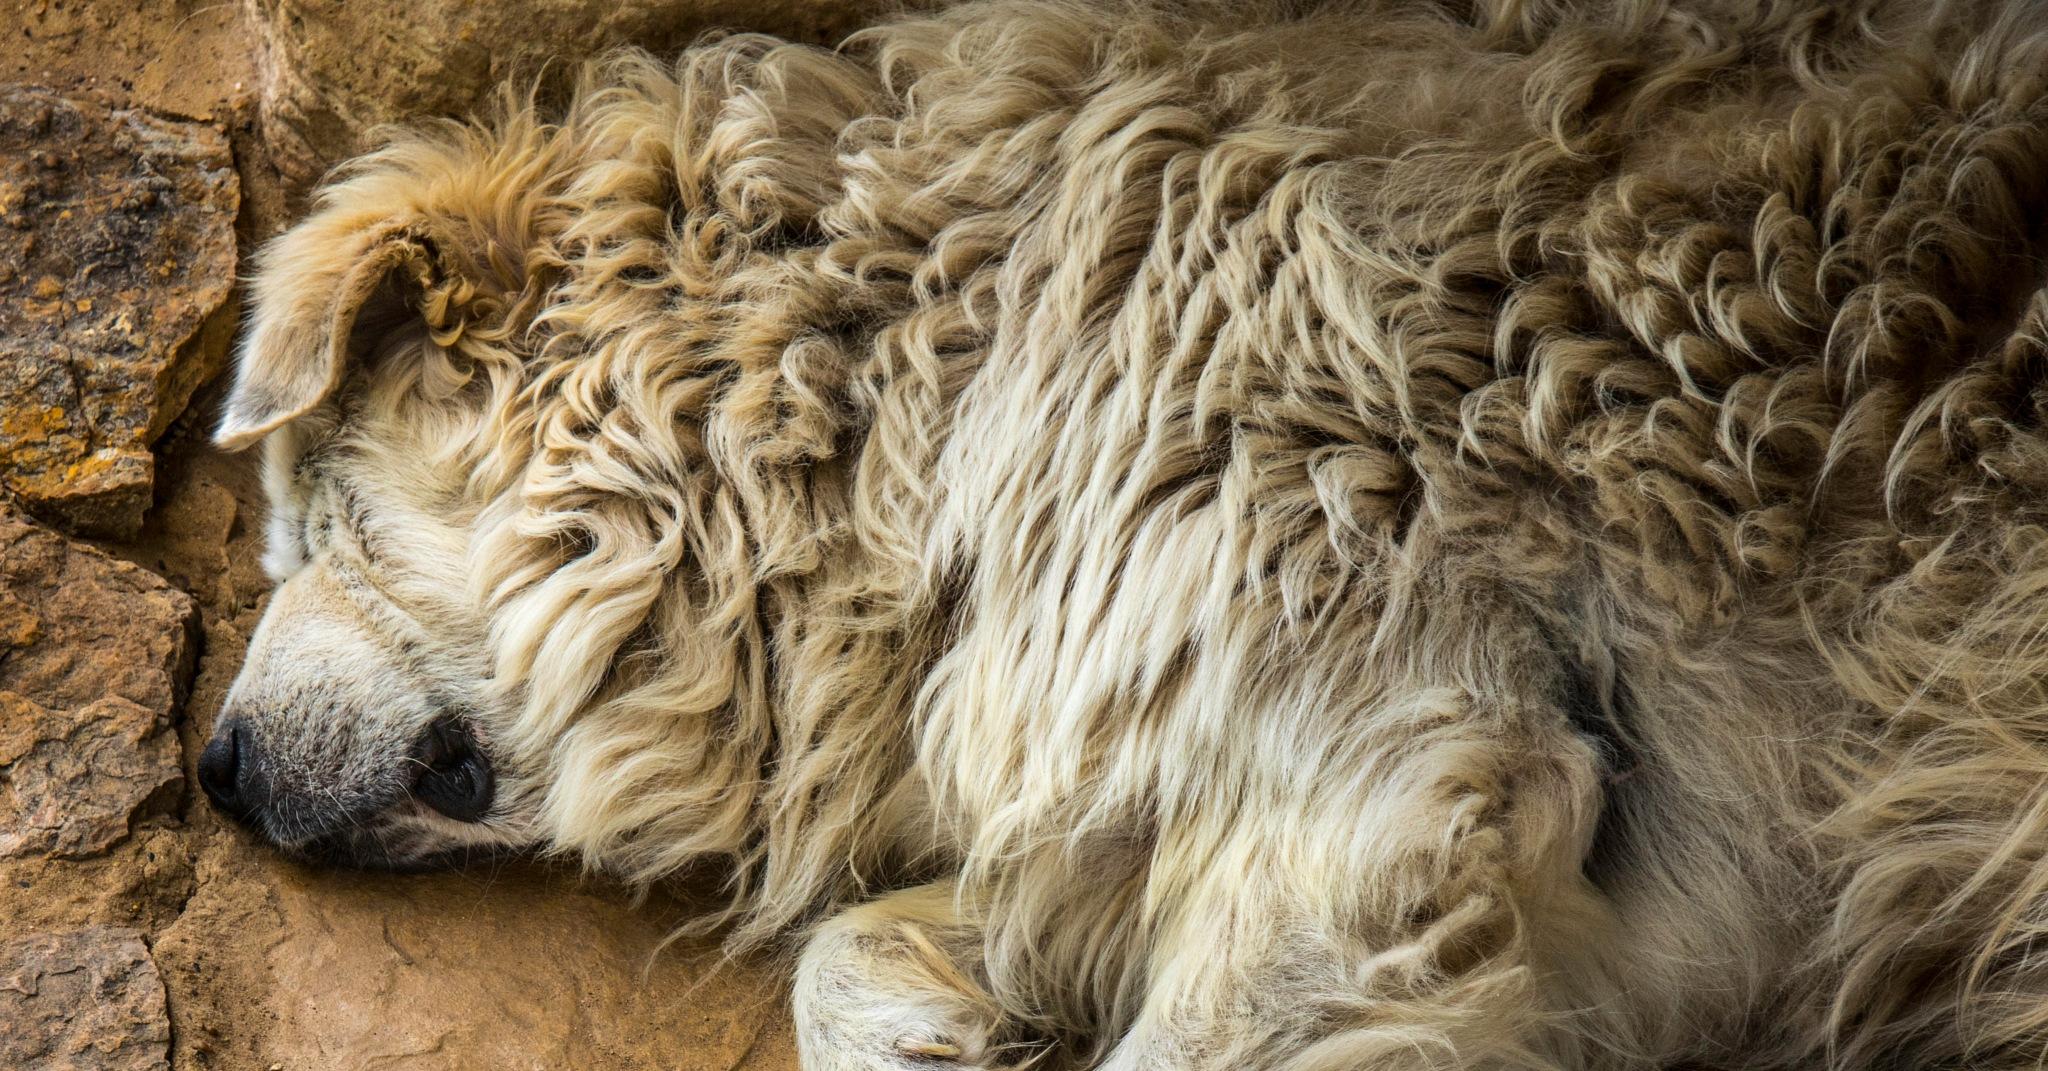 Pile of Pet by FritzMendell